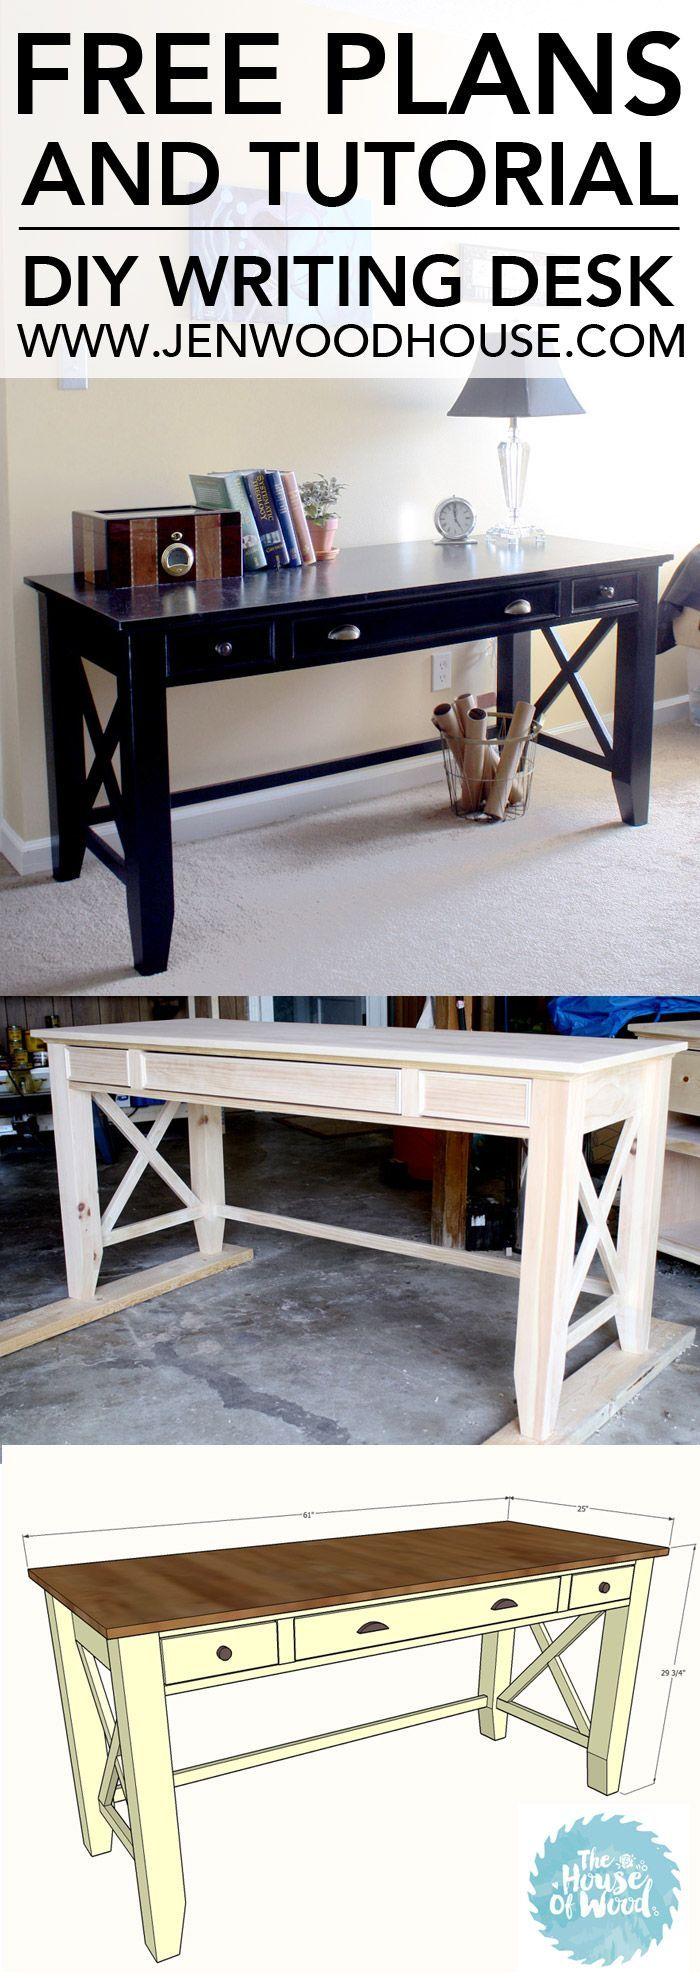 133 best Office Tutorials images on Pinterest Woodworking